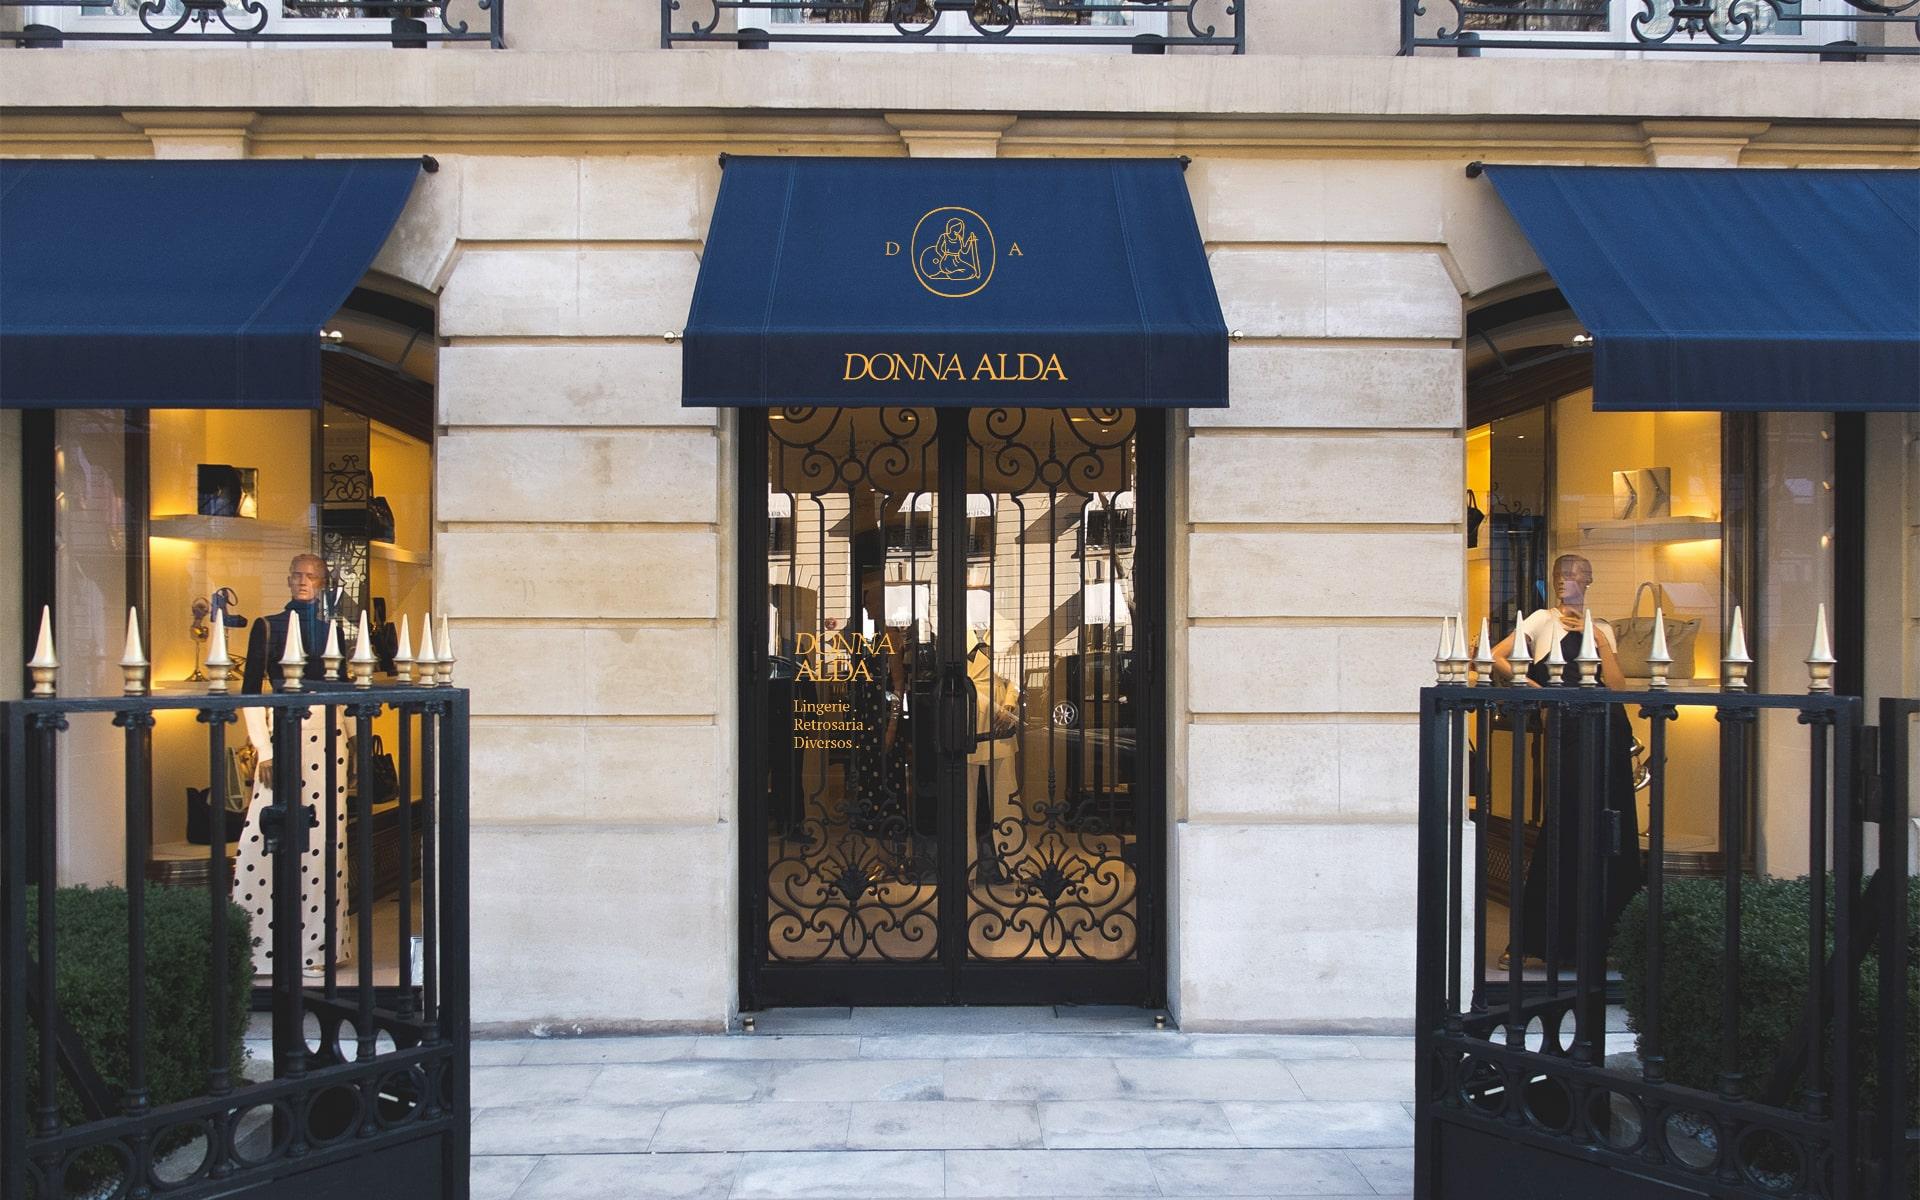 Raquel Fernandes Creates Branding for Donna Alda Store